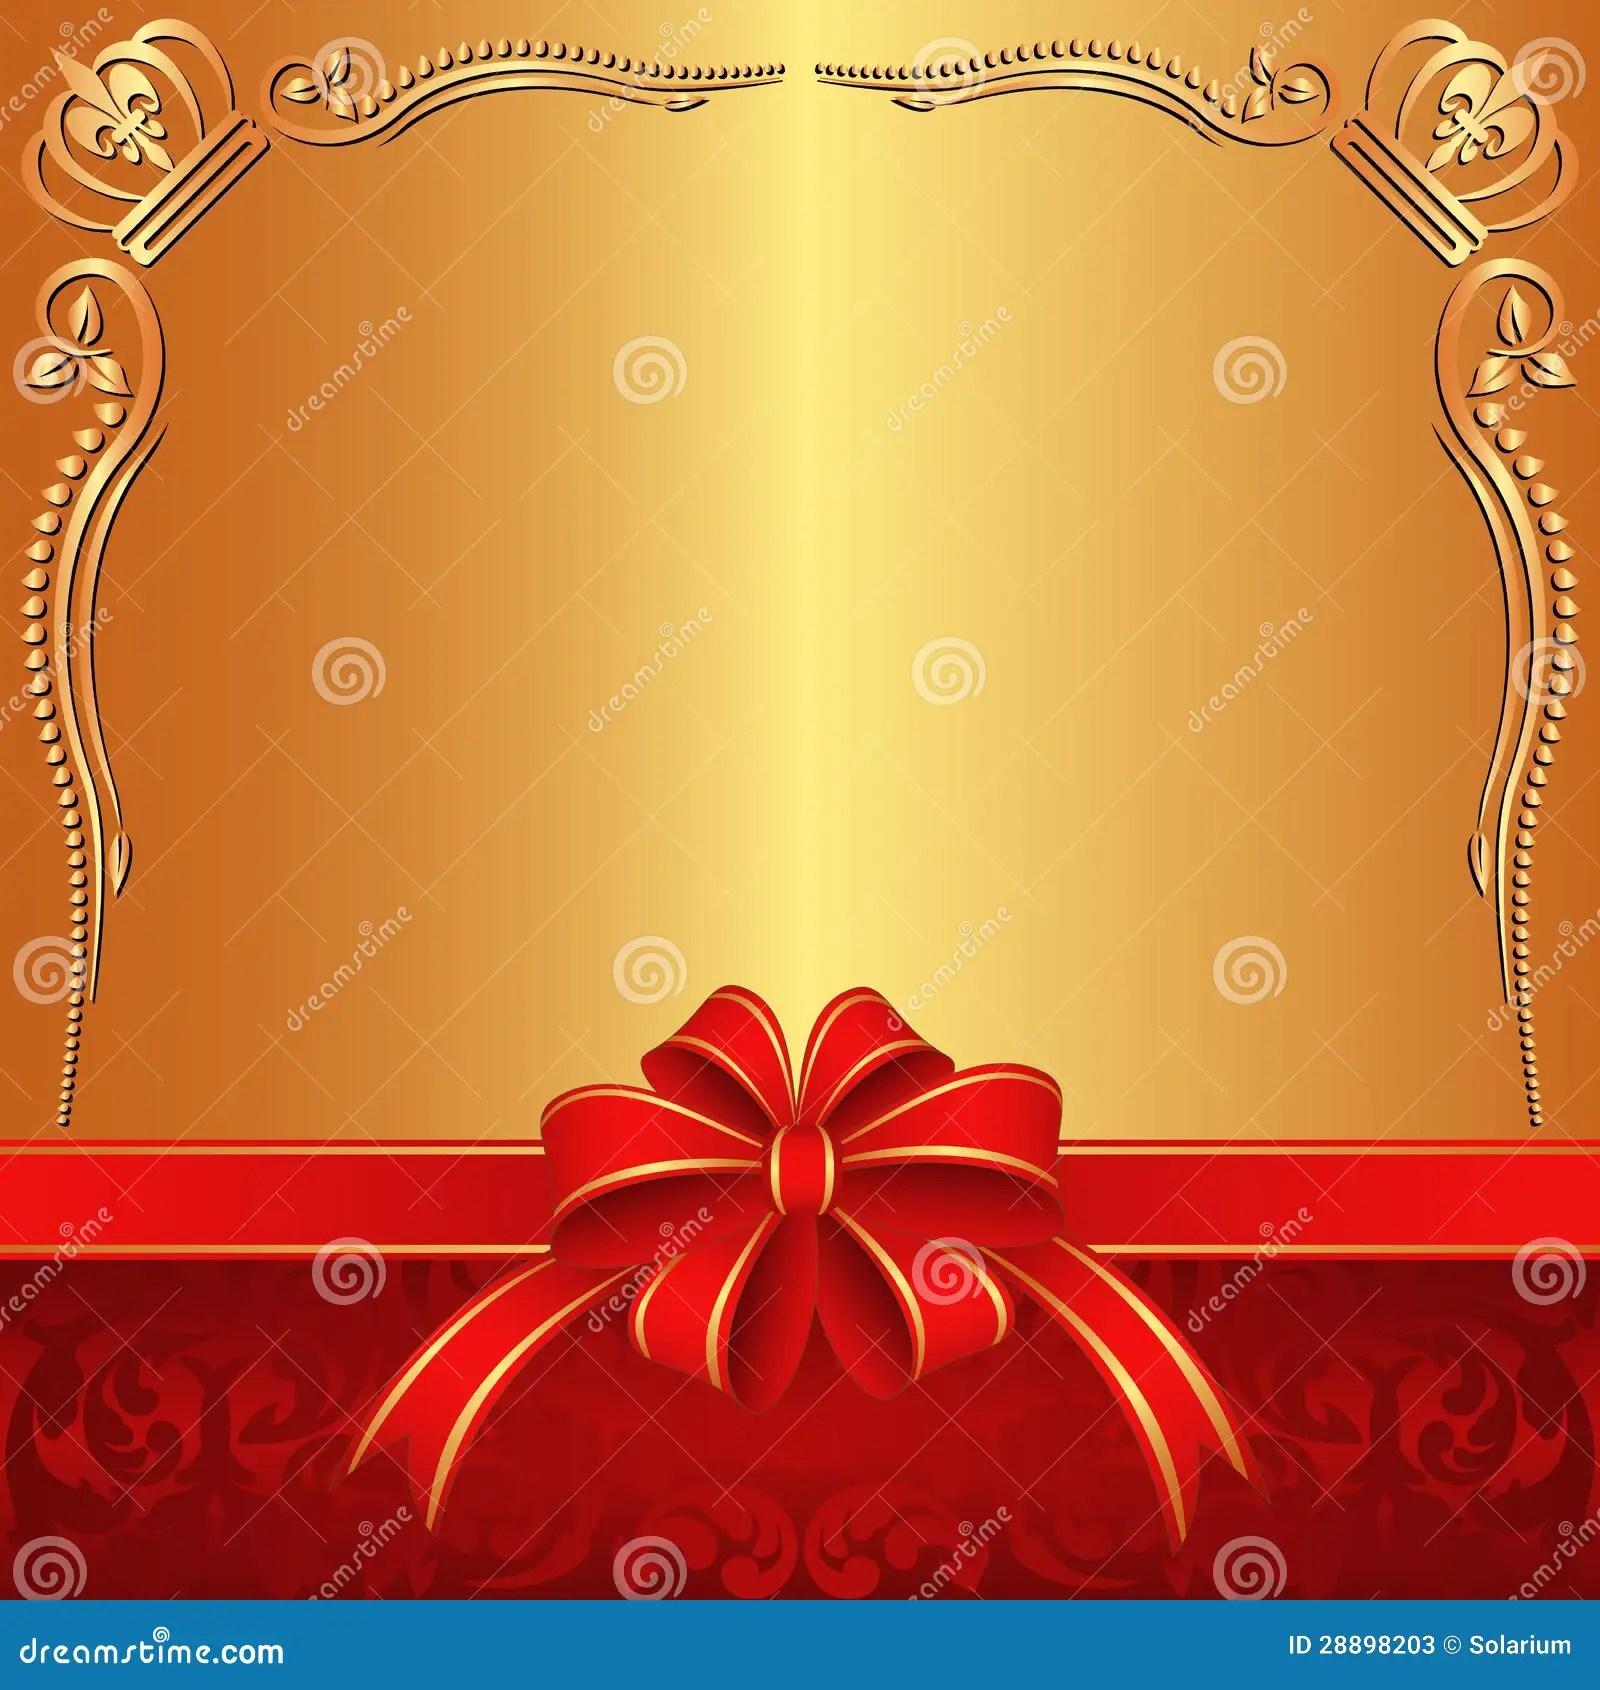 Golden Background Stock Photos Image 28898203